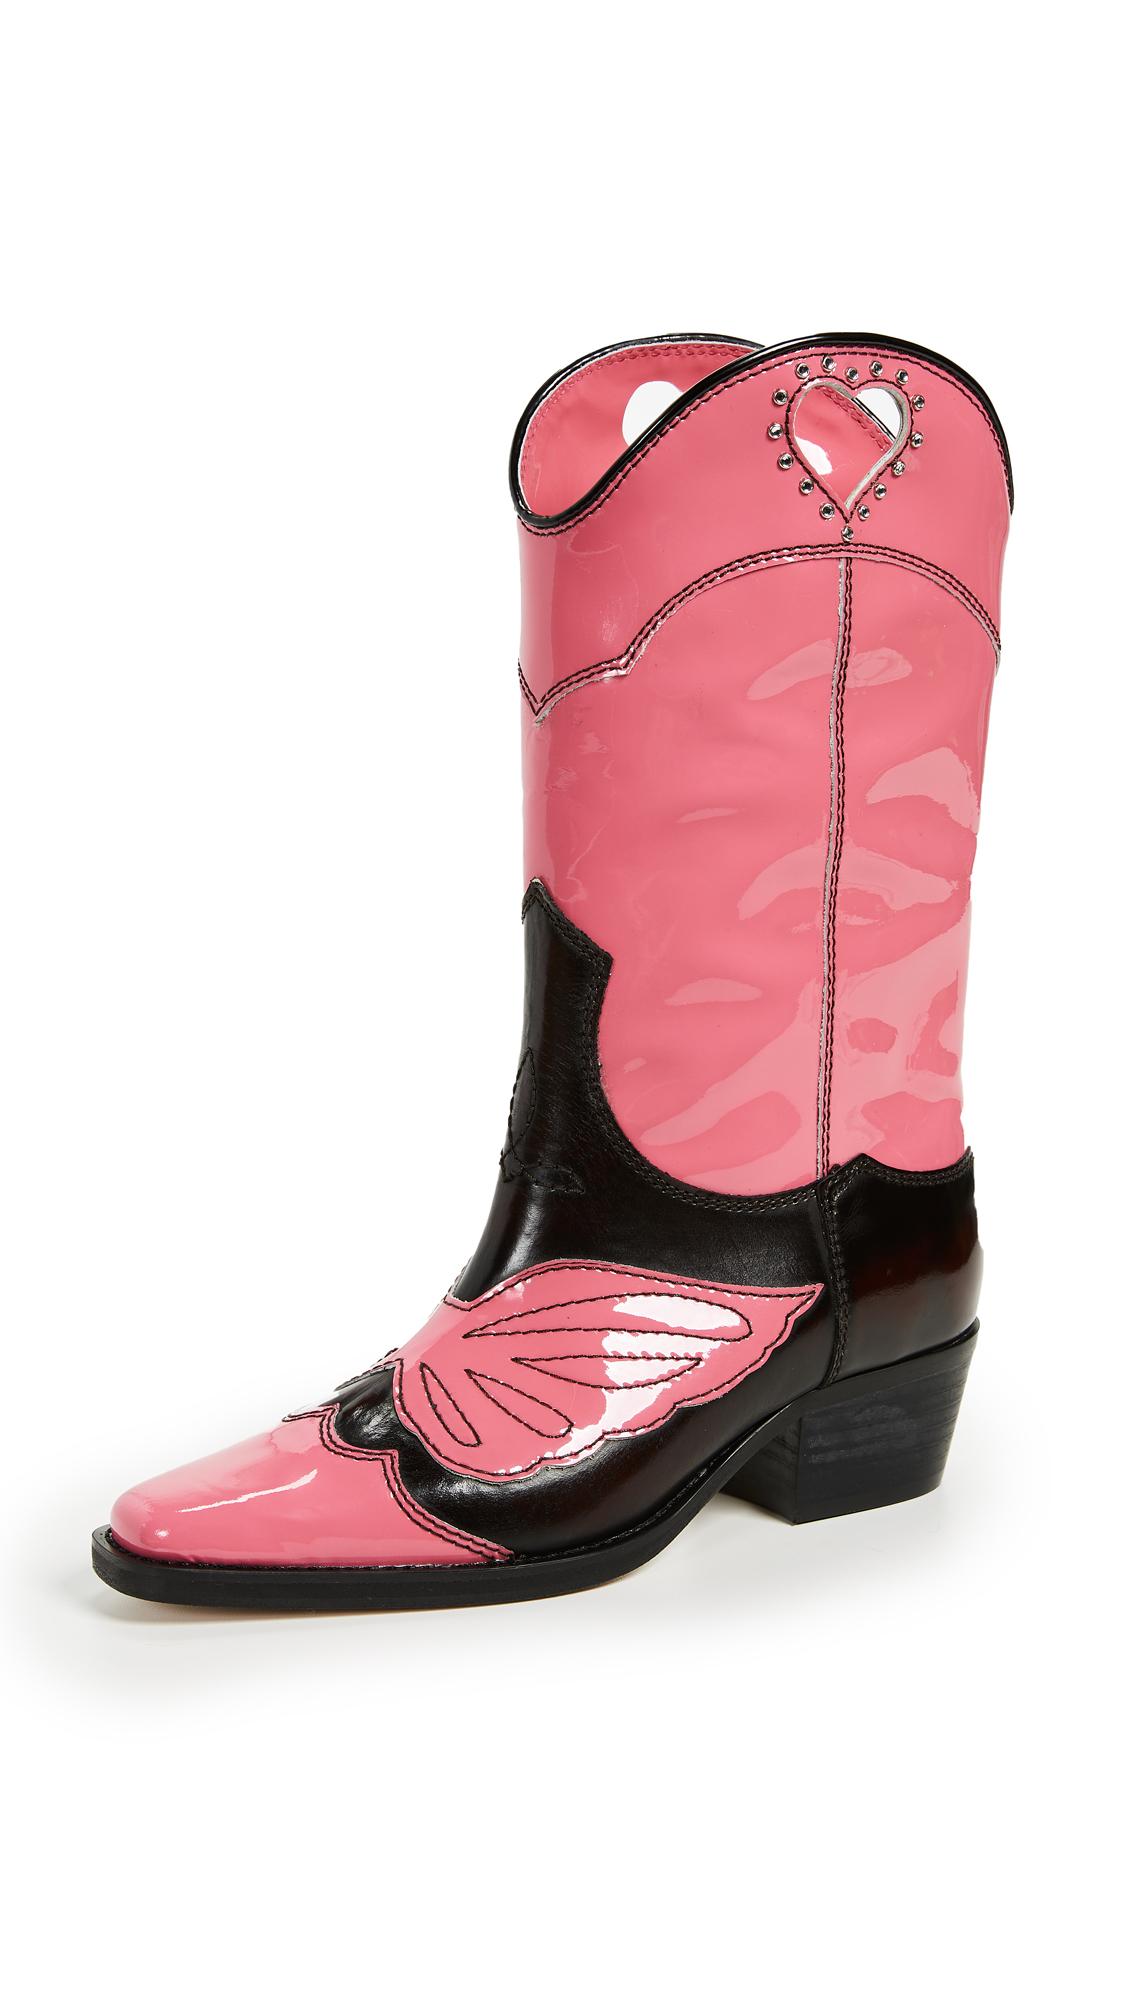 GANNI Marlyn Boots - Hot Pink